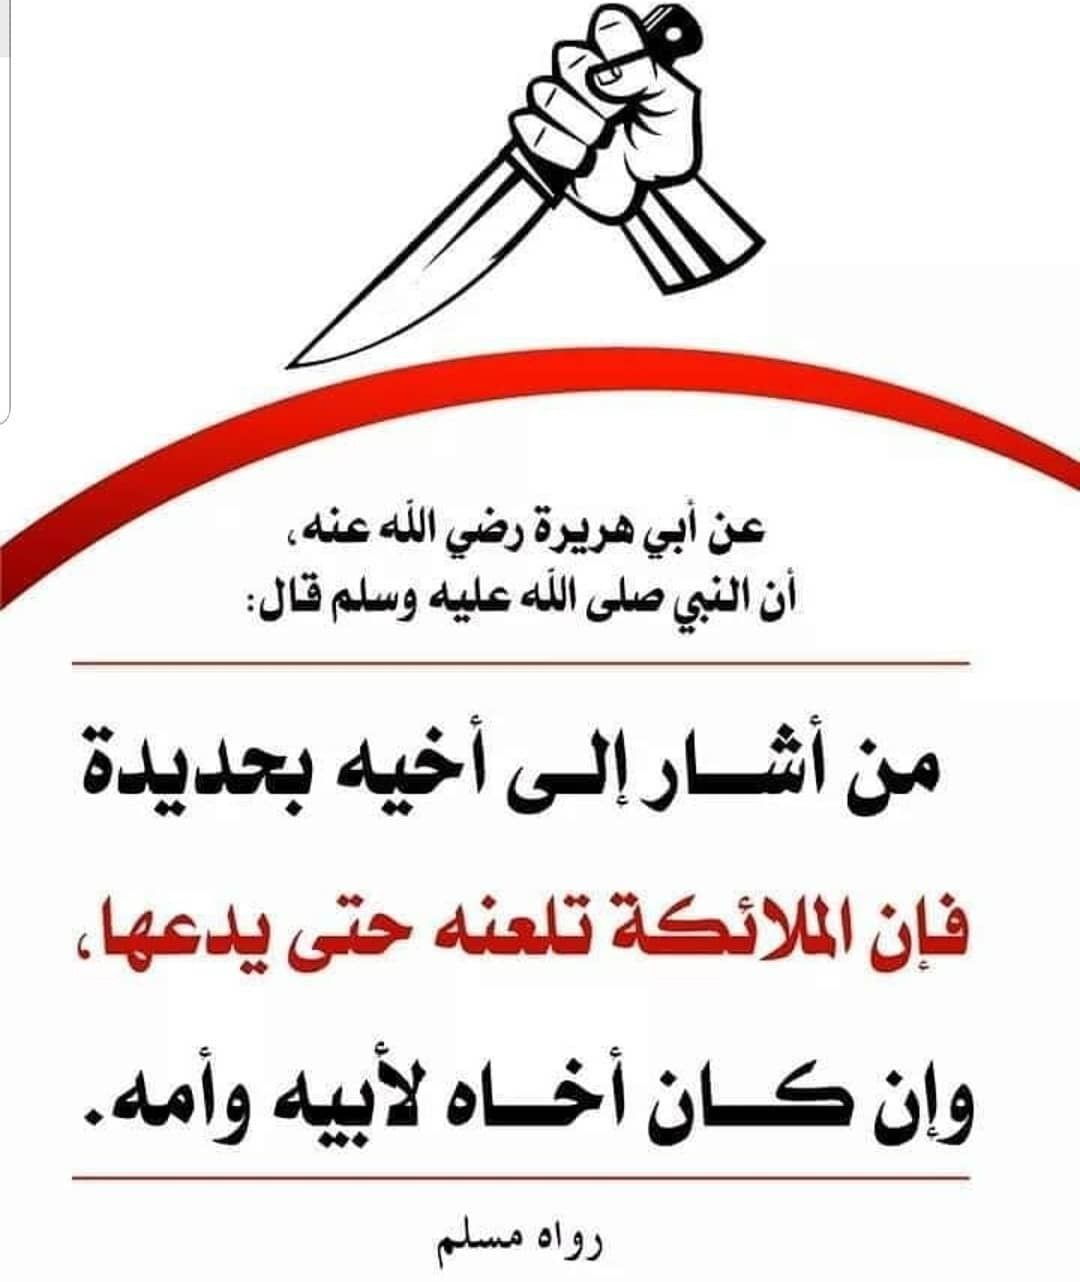 حديث النبي صلى الله عليه وسلم Ahadith Quotes Islamic Dua